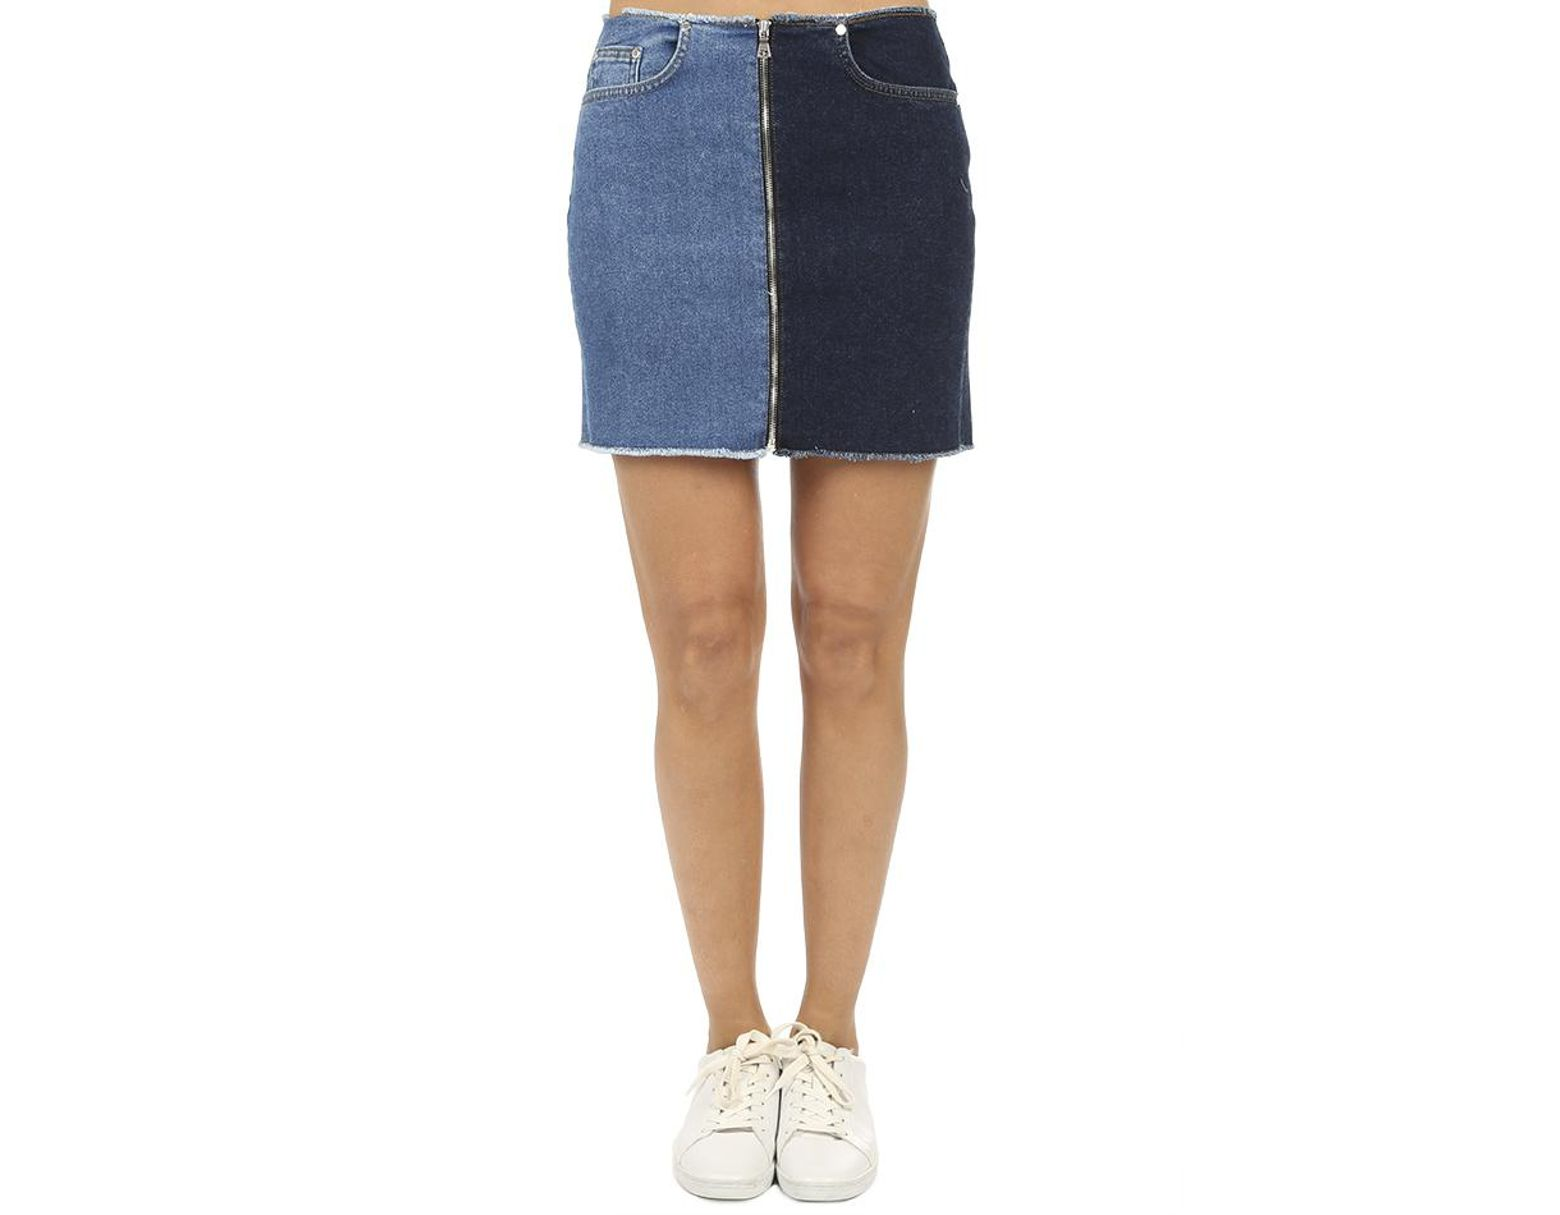 d2c507ba8d Cotton Citizen Mercer Two-tone Zip Mini Skirt in Blue - Save 25% - Lyst